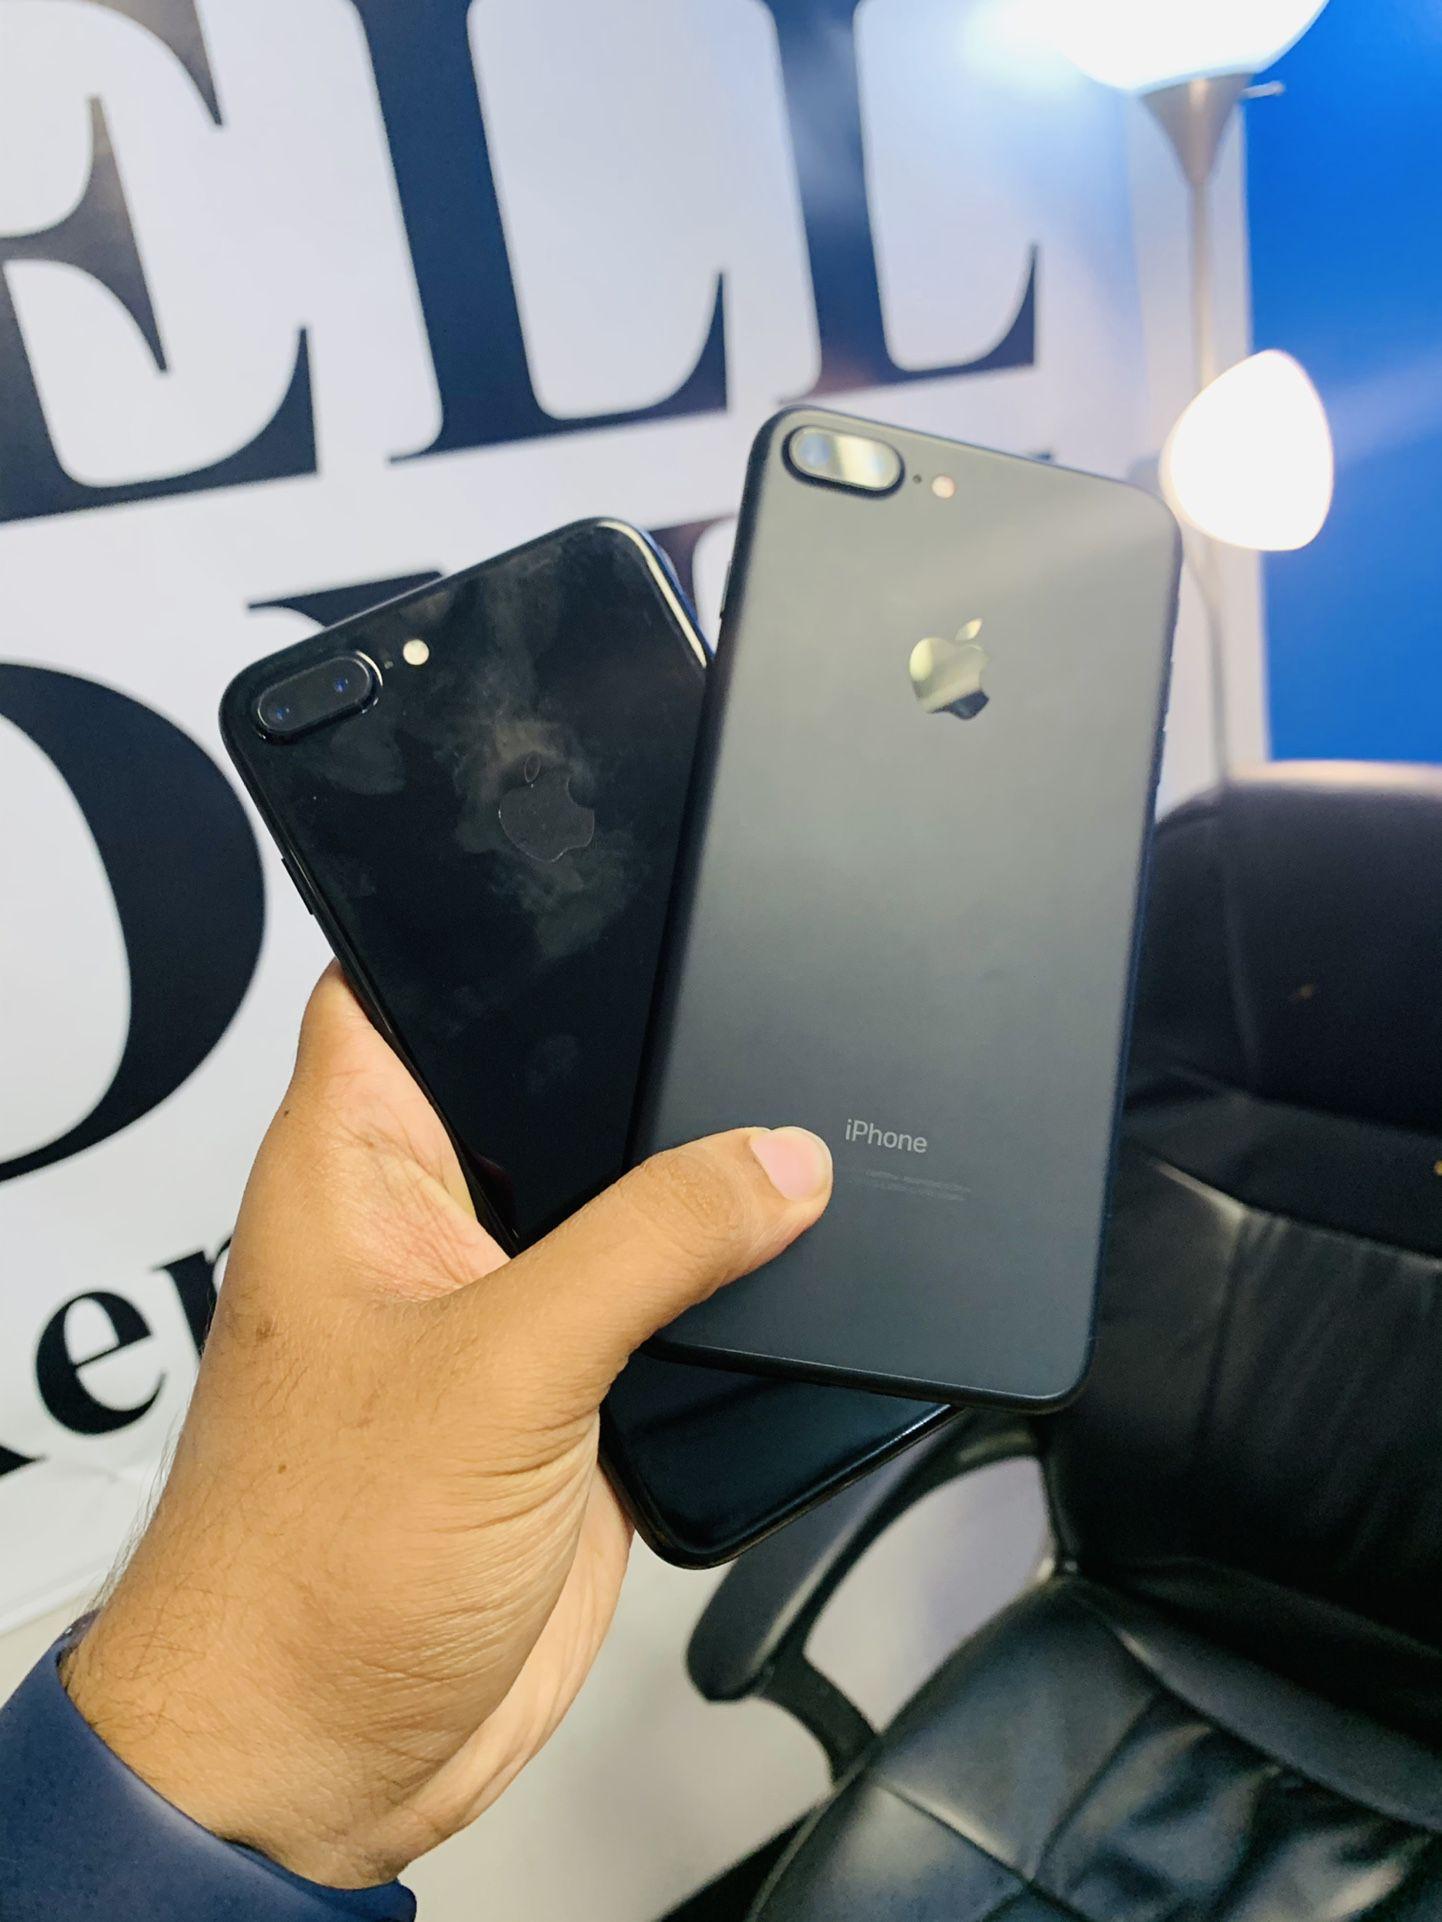 iPhone 7 Plus 128gb Unlokced